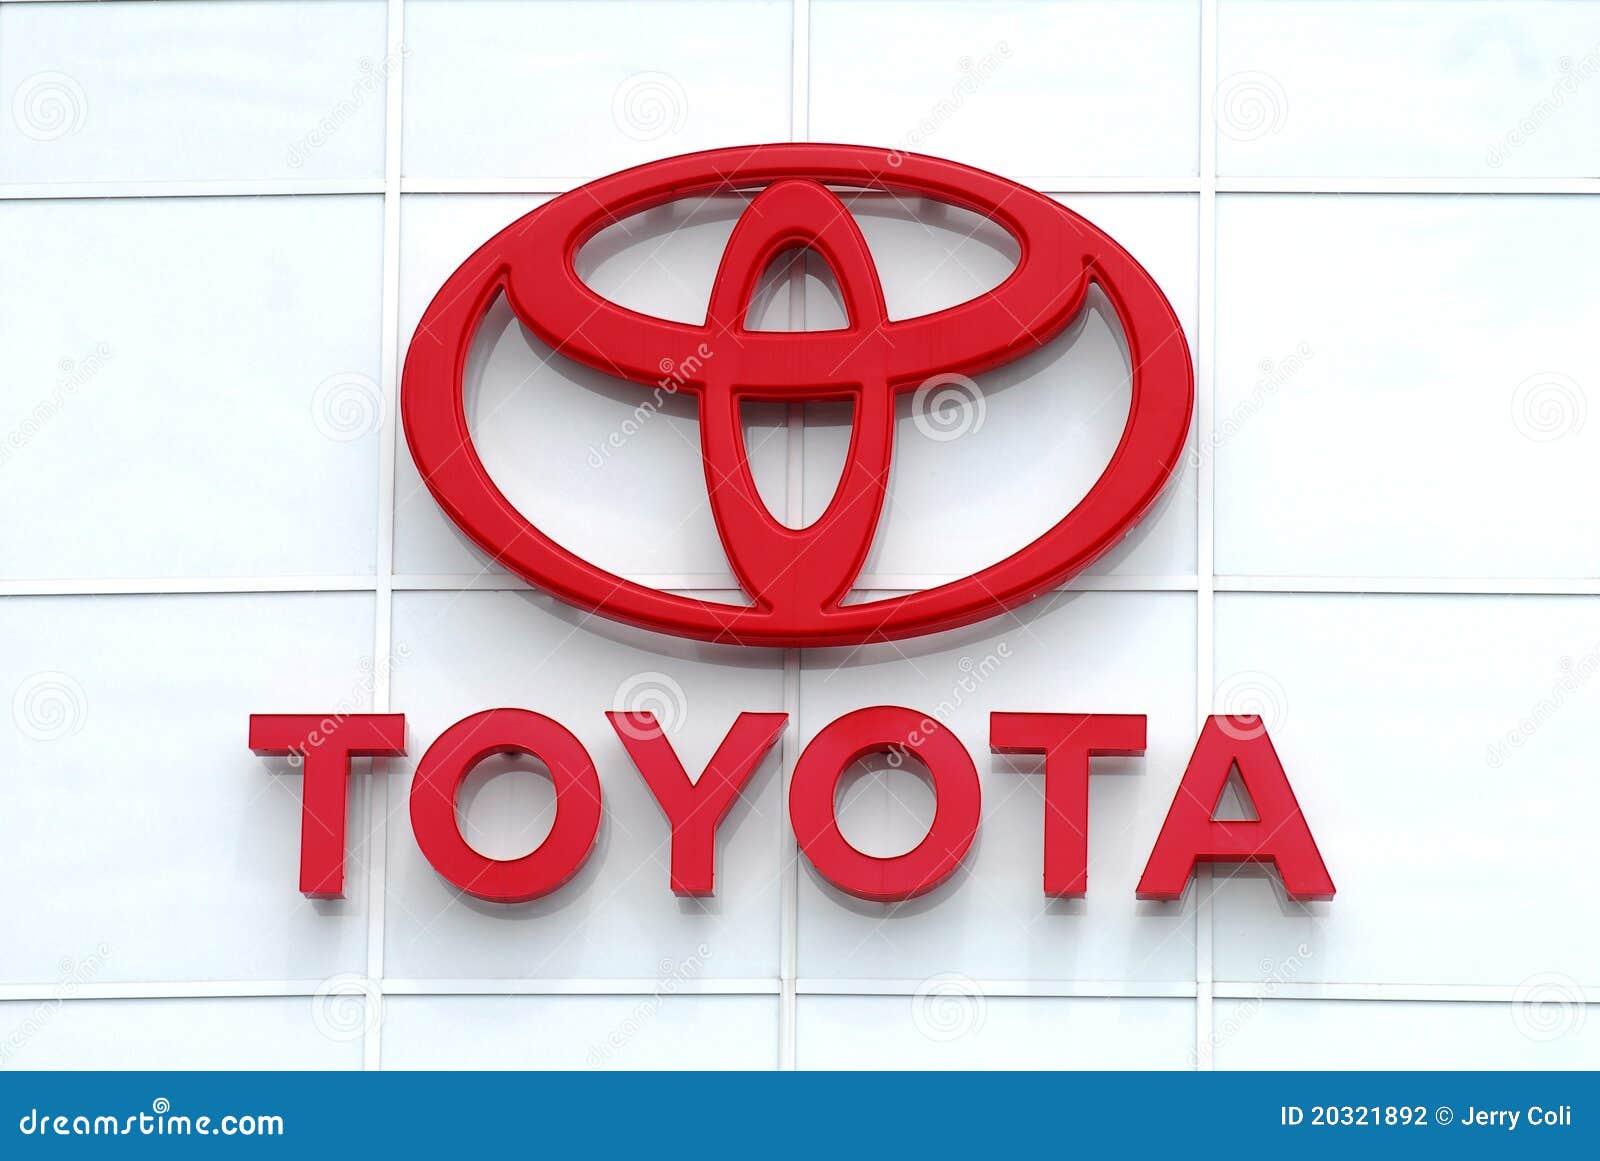 Toyota califica insignia